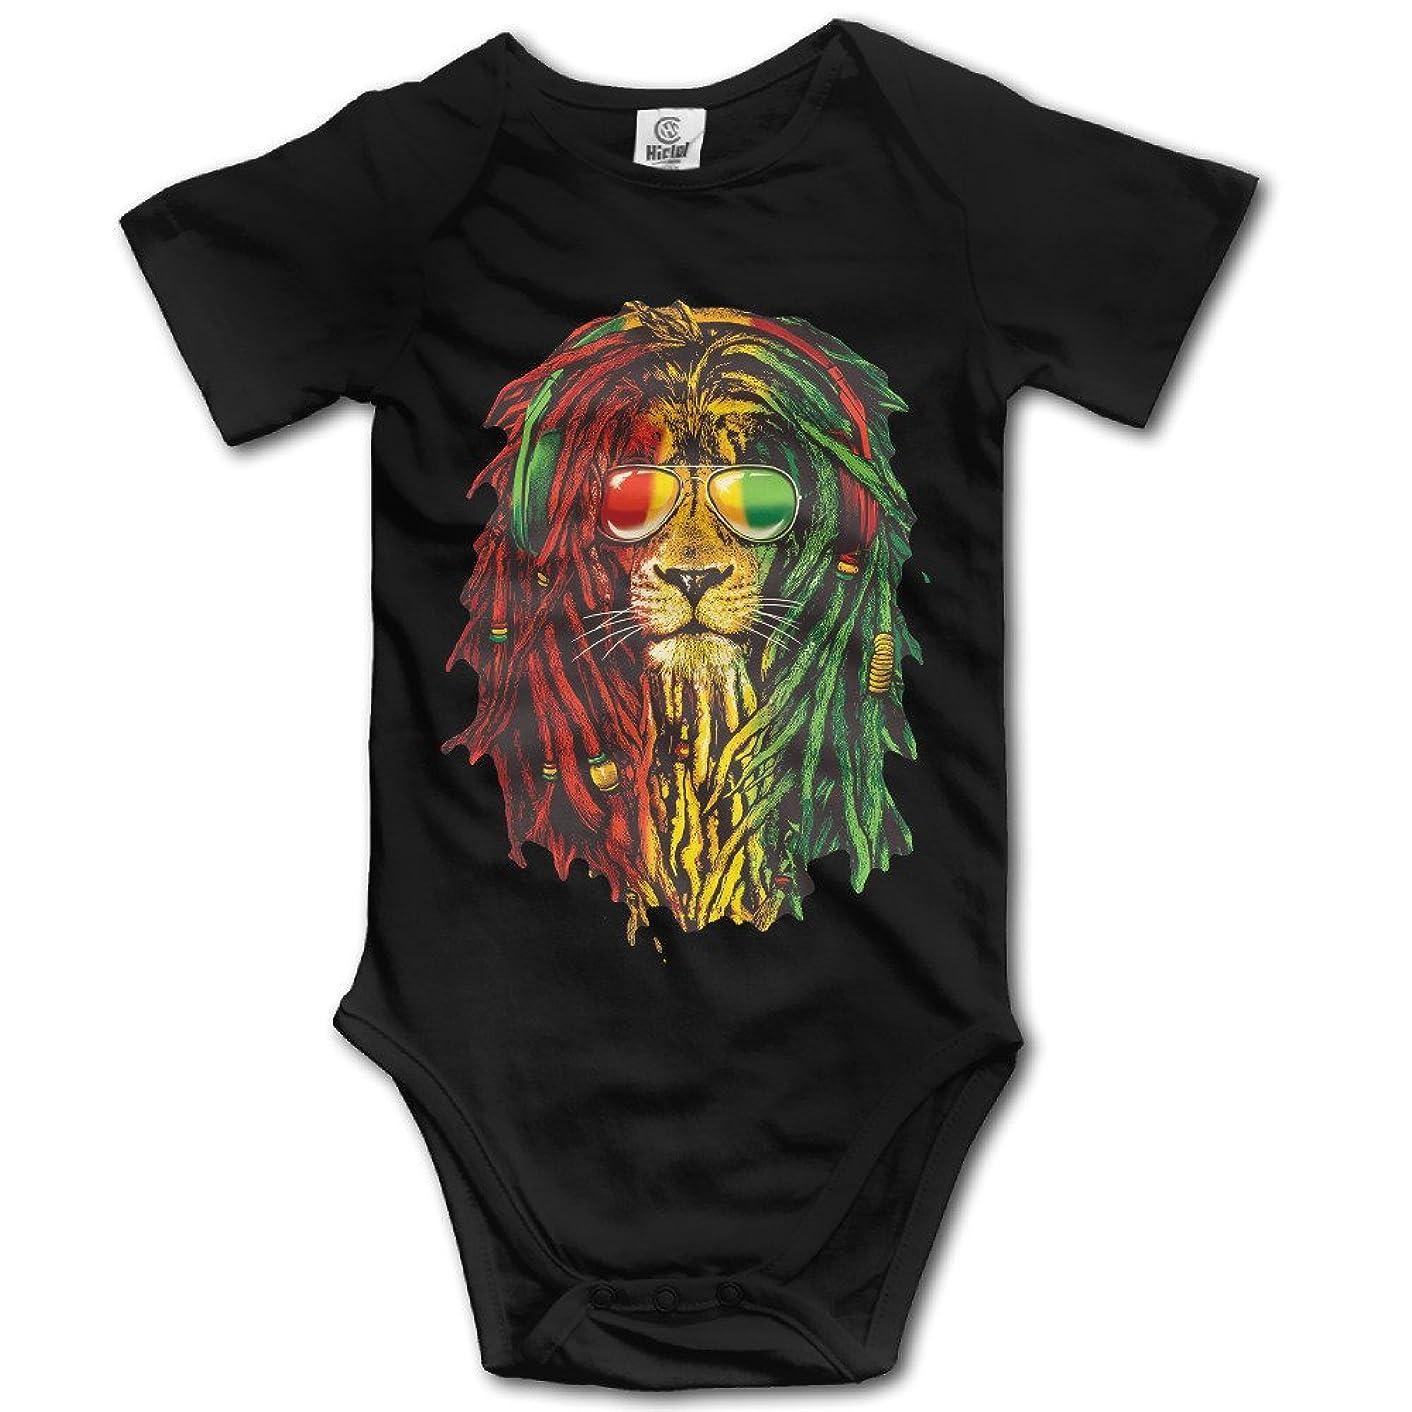 NUBIA Toddler Lion Rasta Style Short Sleeve Romper Bodysuit Black